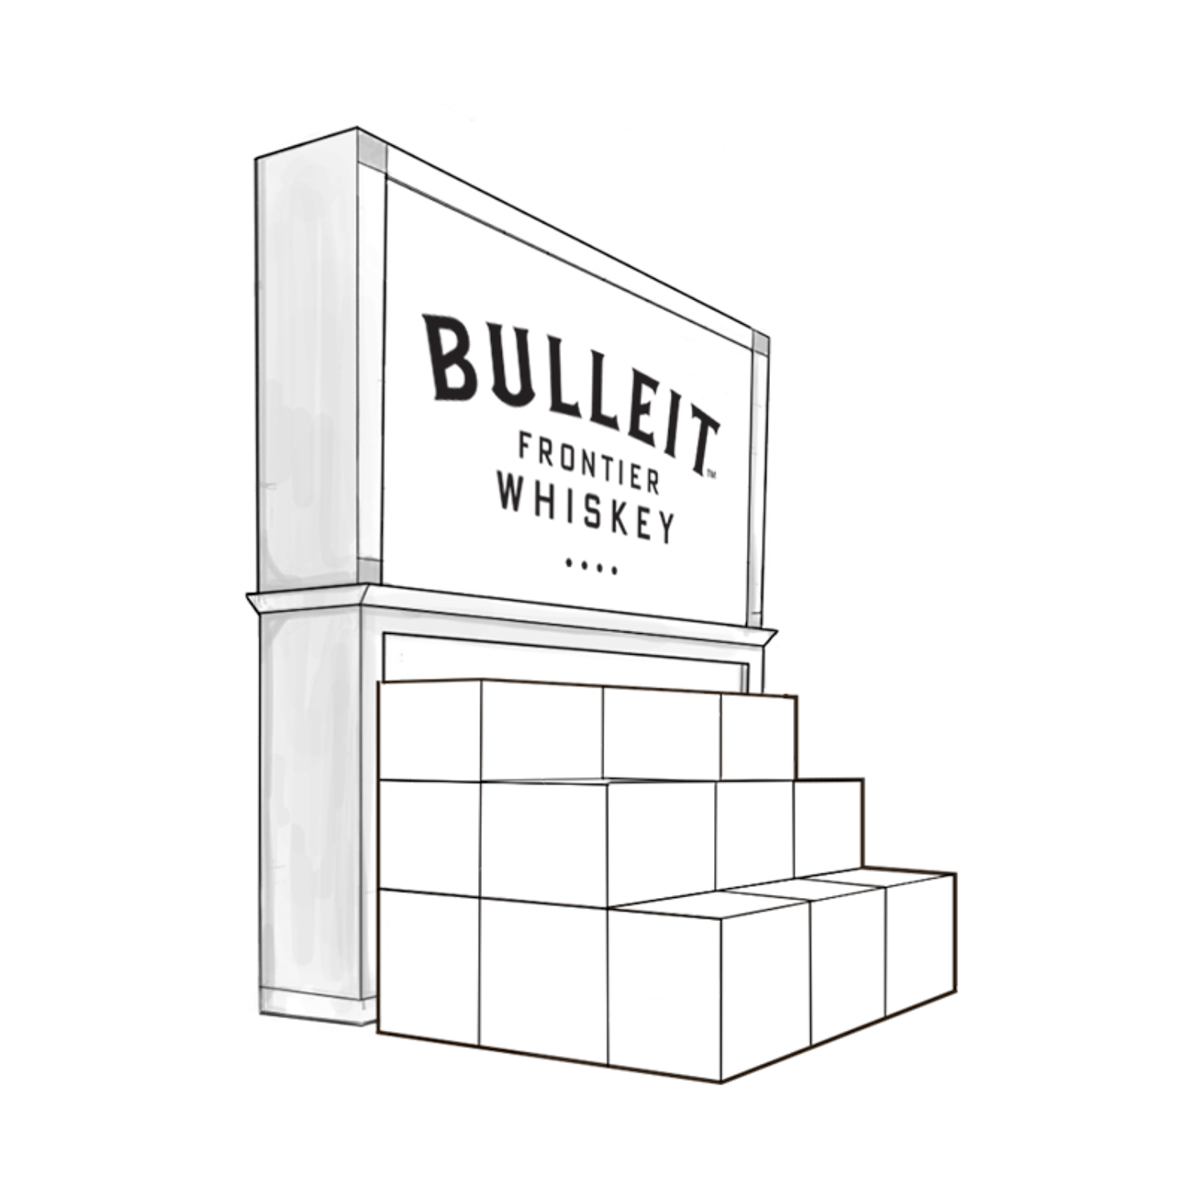 Bulleitdisplays3.jpg